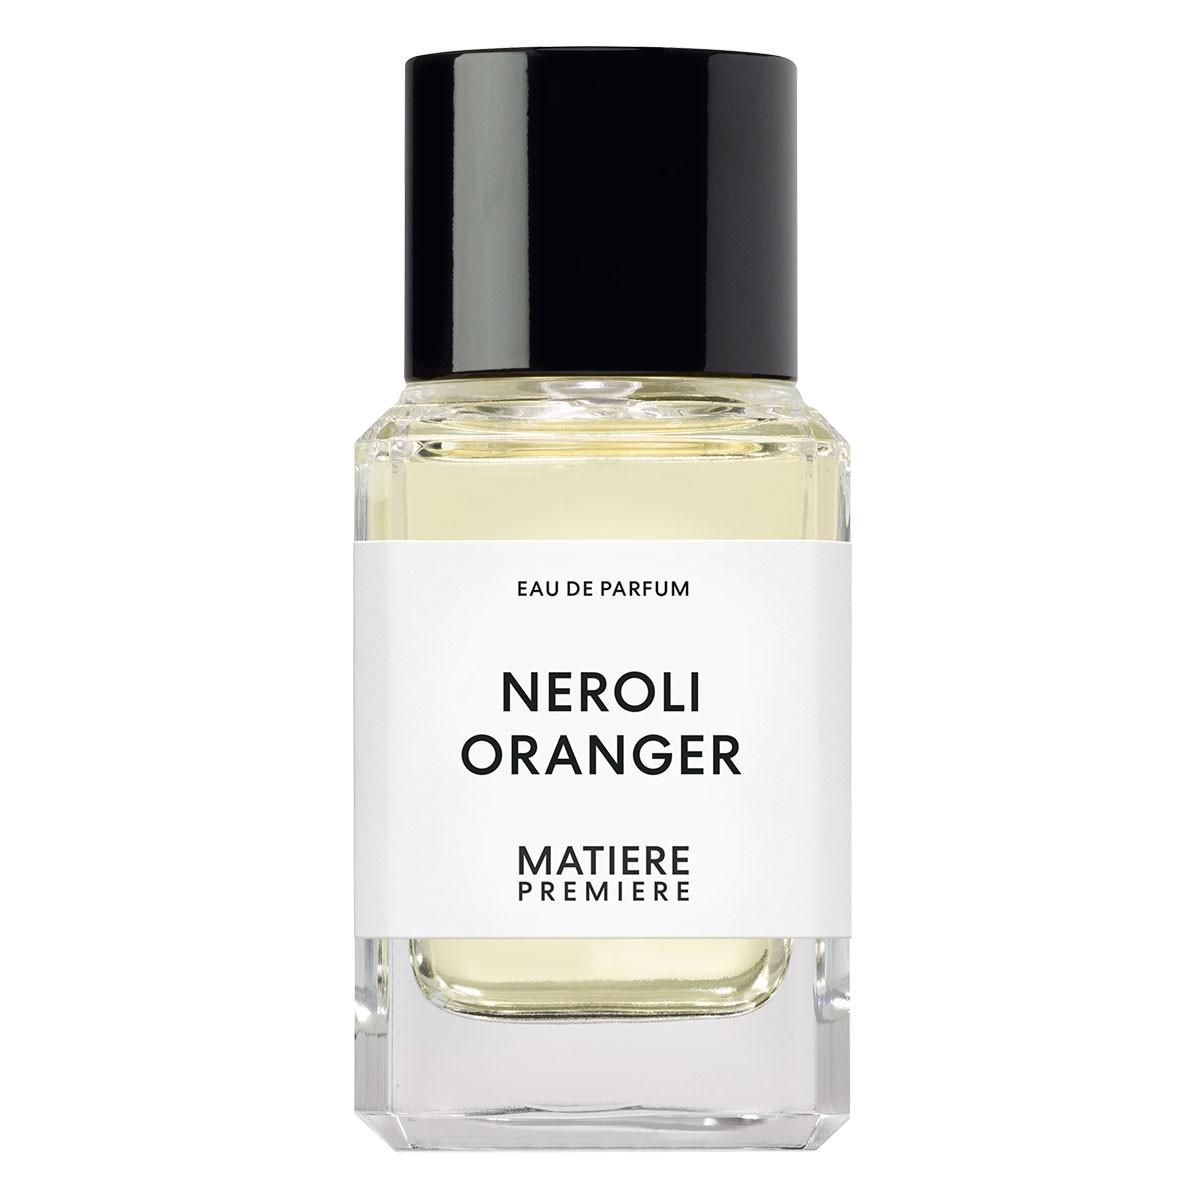 Matiere Premiere Neroli Oranger 100ml - Perfume